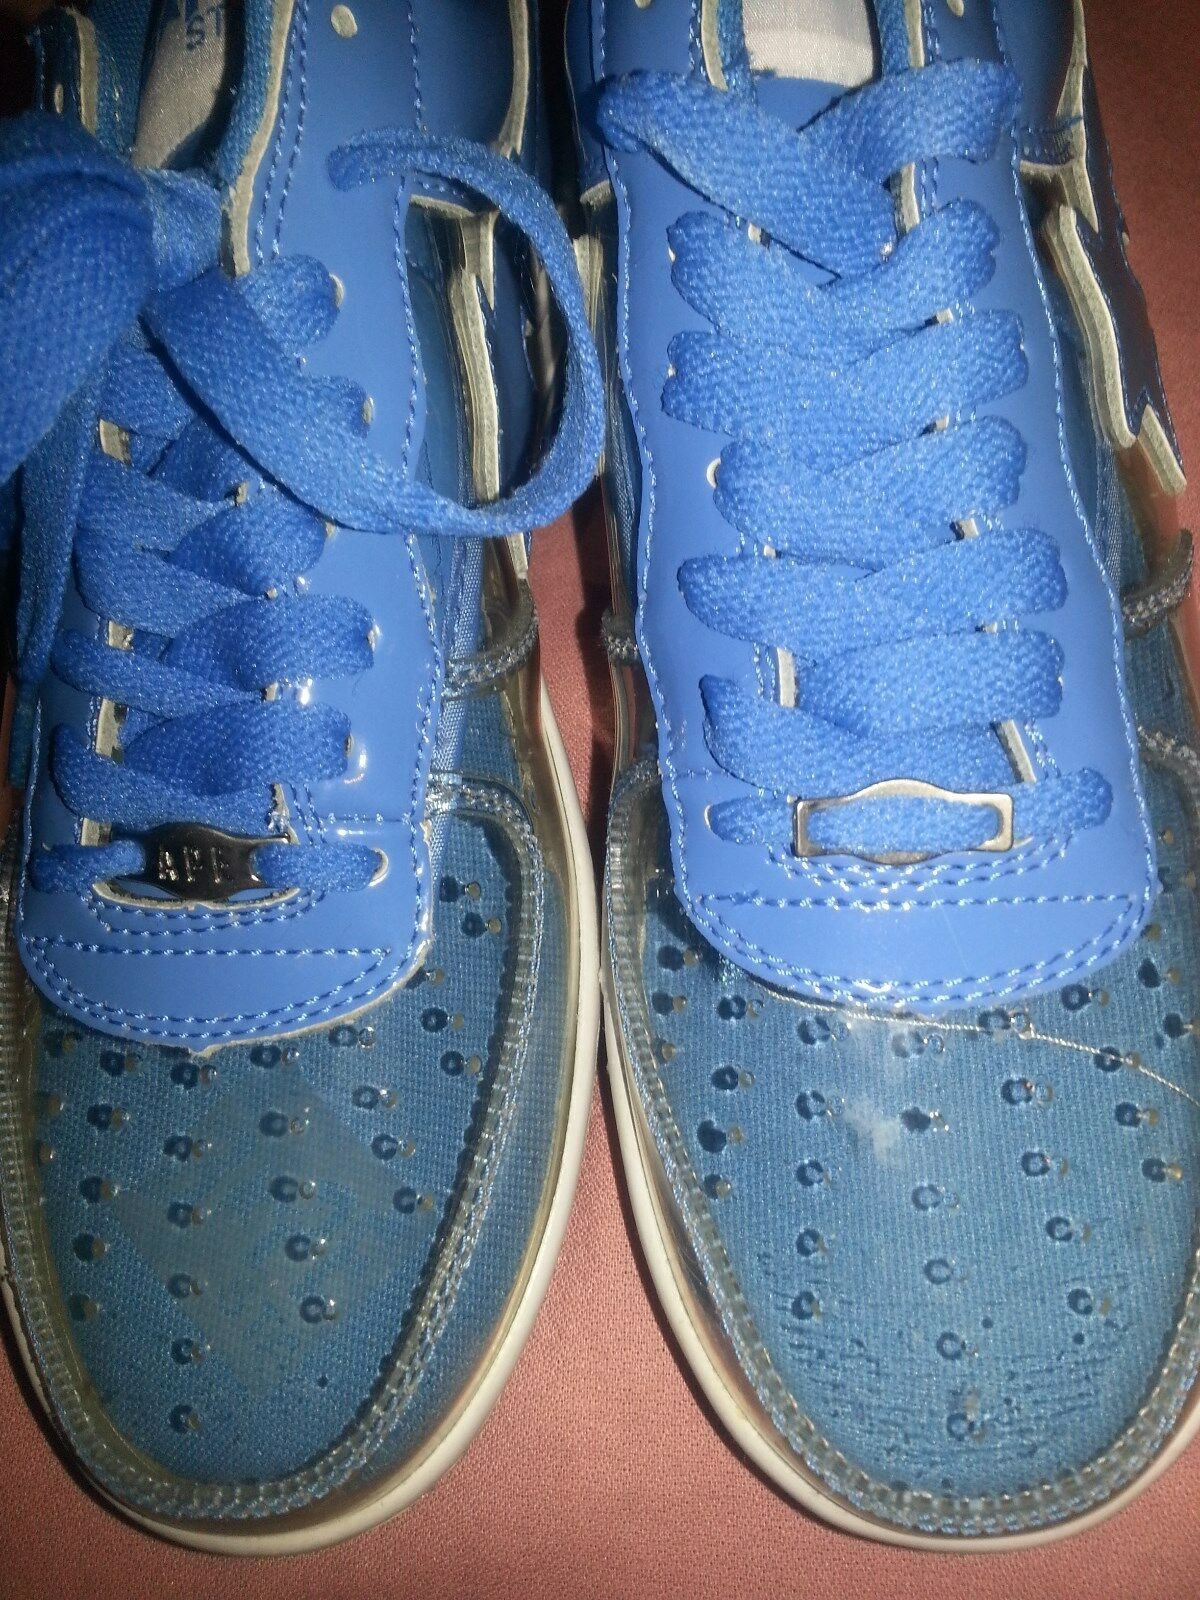 Bathing Ape mens shoe size 6.5 Sky bluee and Clear